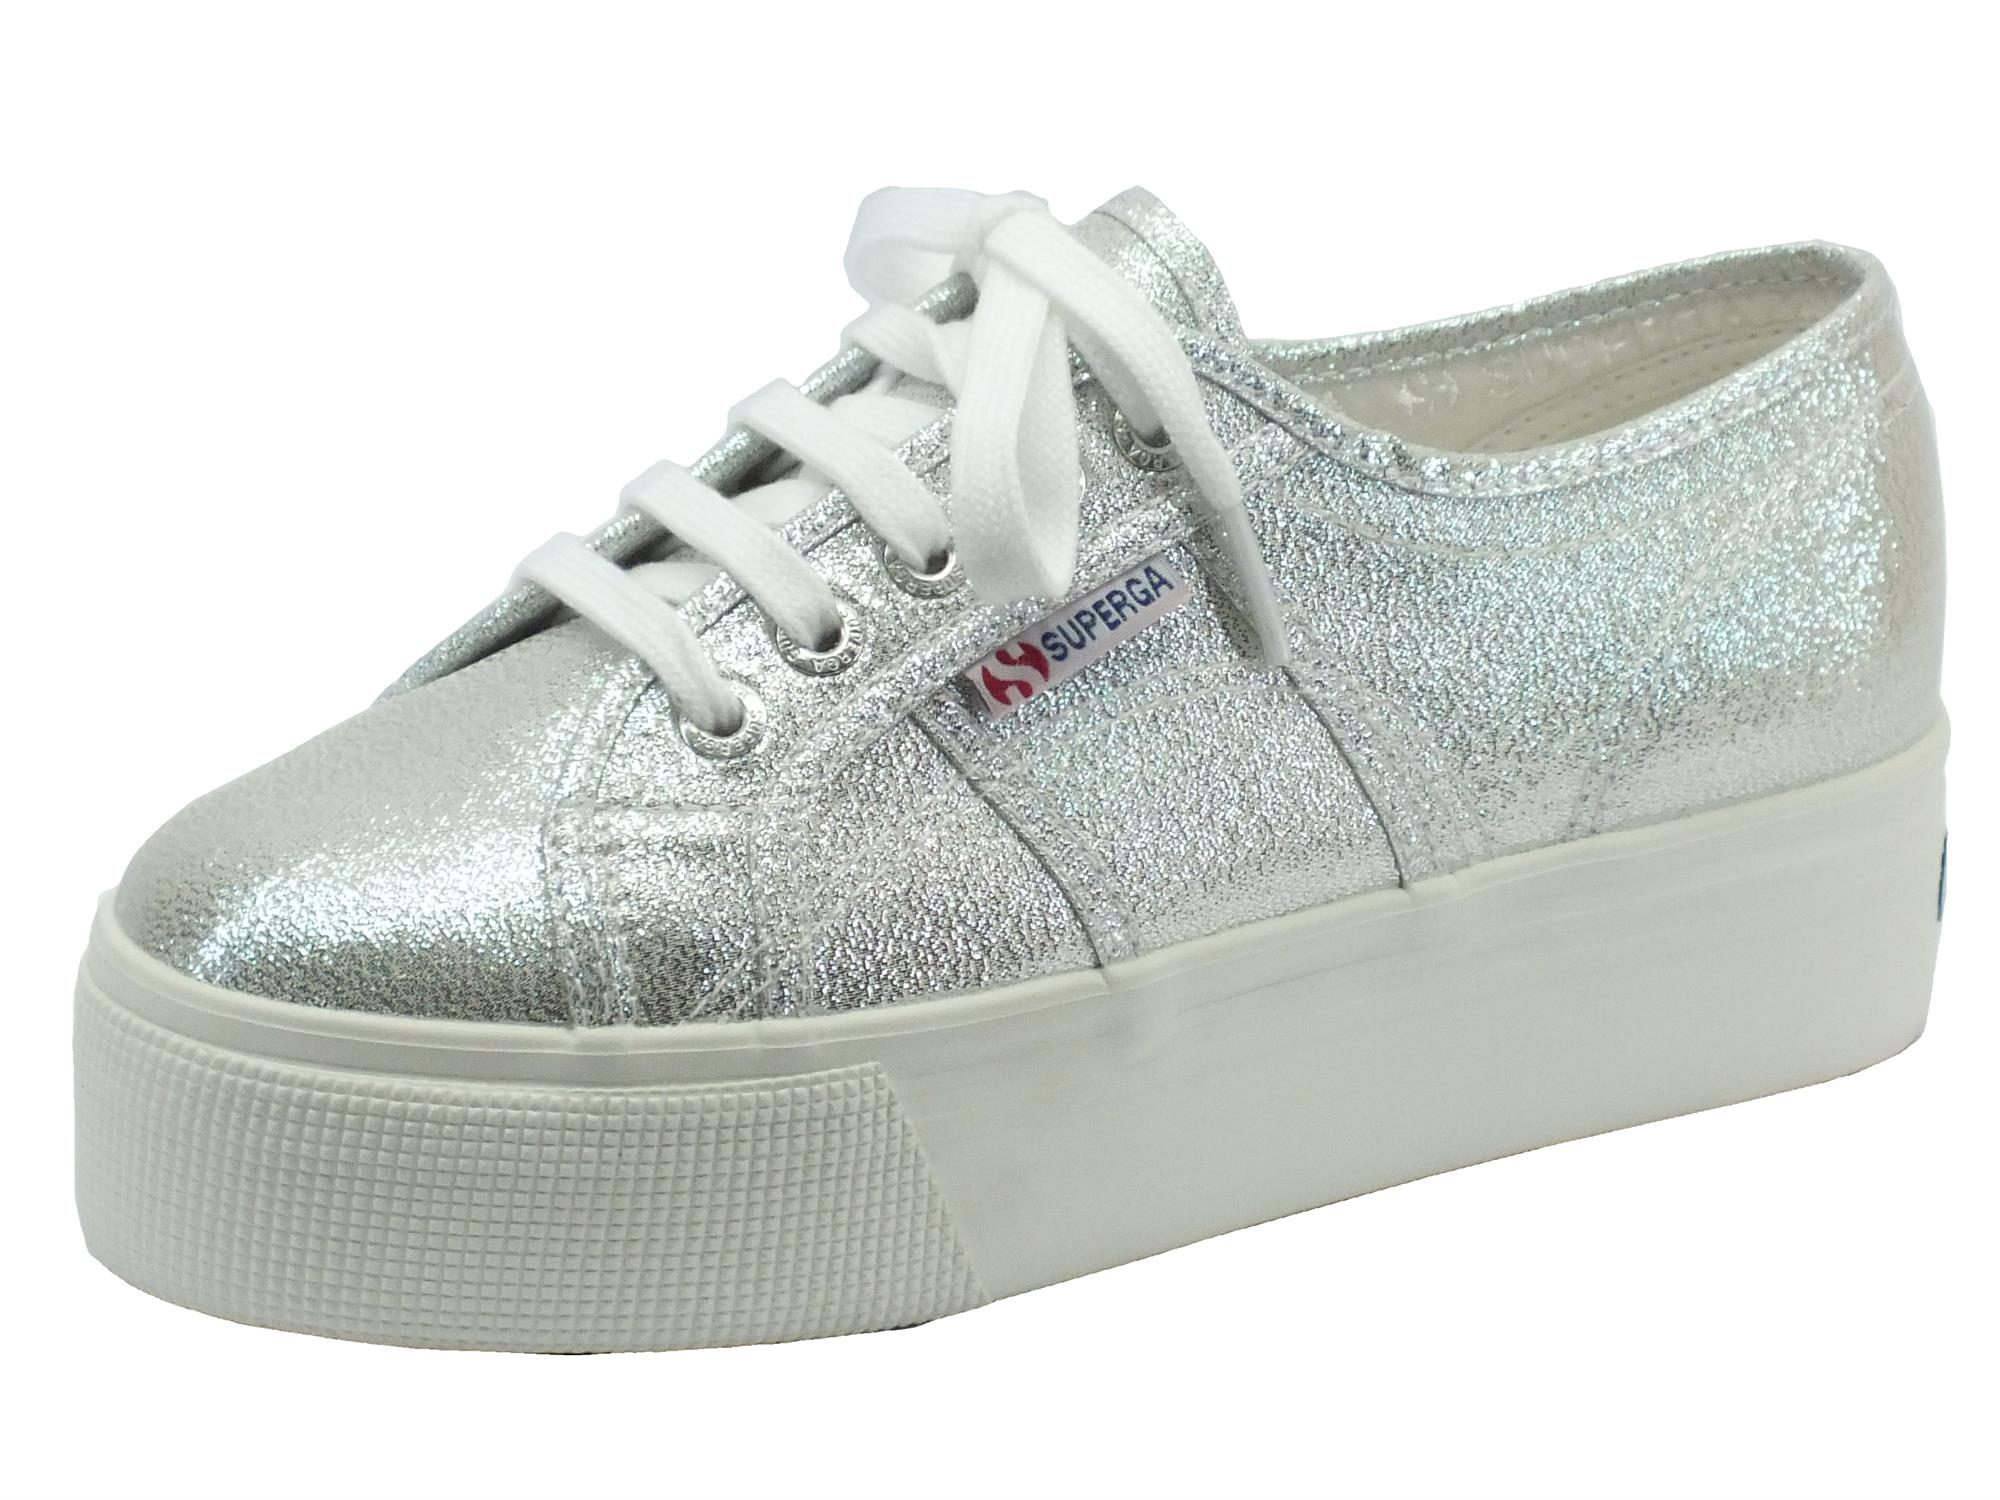 Superga Scarpe grigio argento Colore Donna